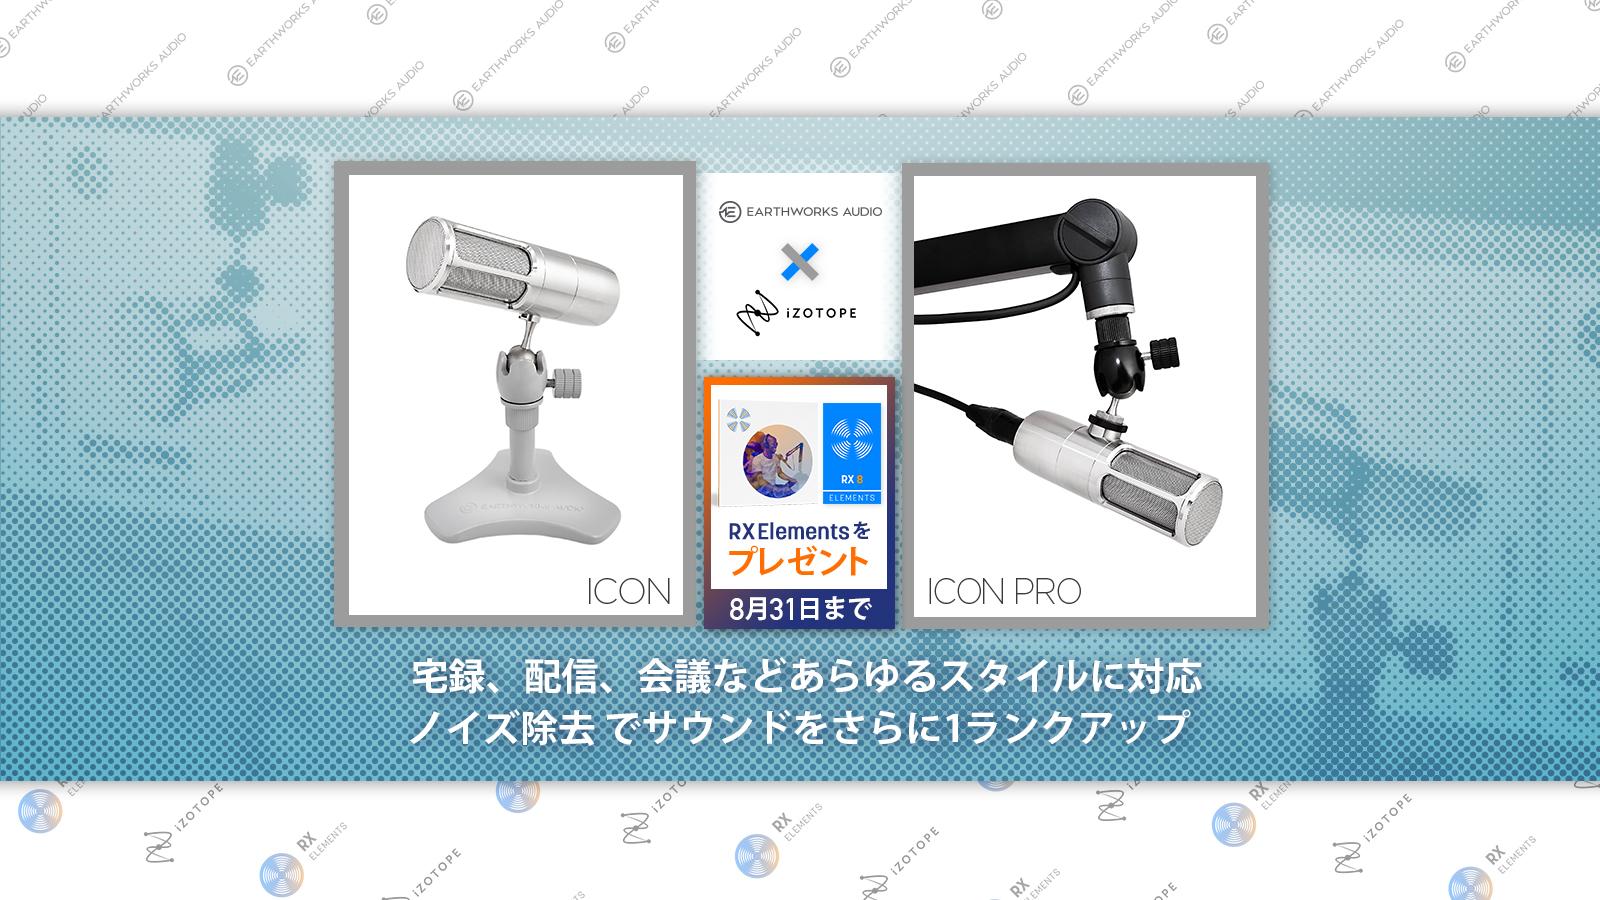 Earthworks ICON/ICON PROをご購入でRX Elements をプレゼント!